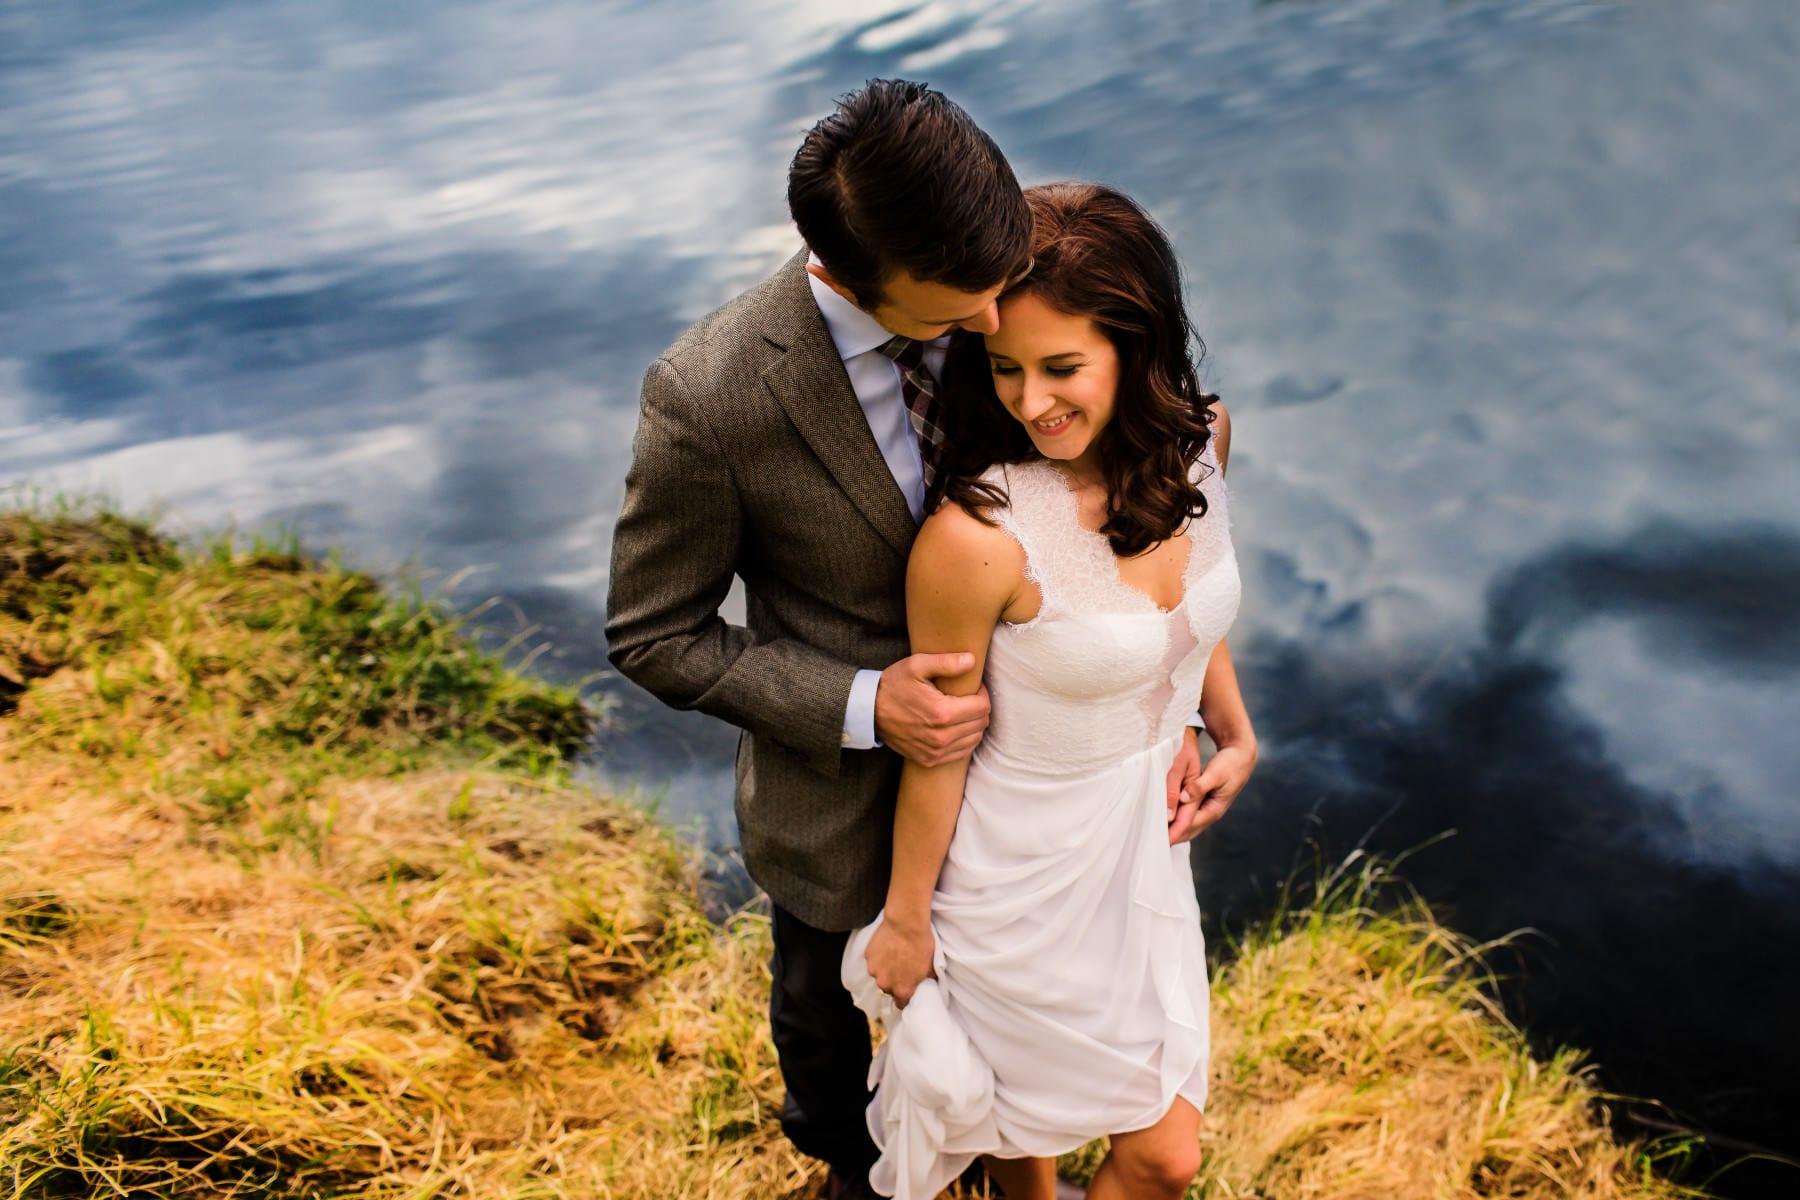 miller_wedding_001-2